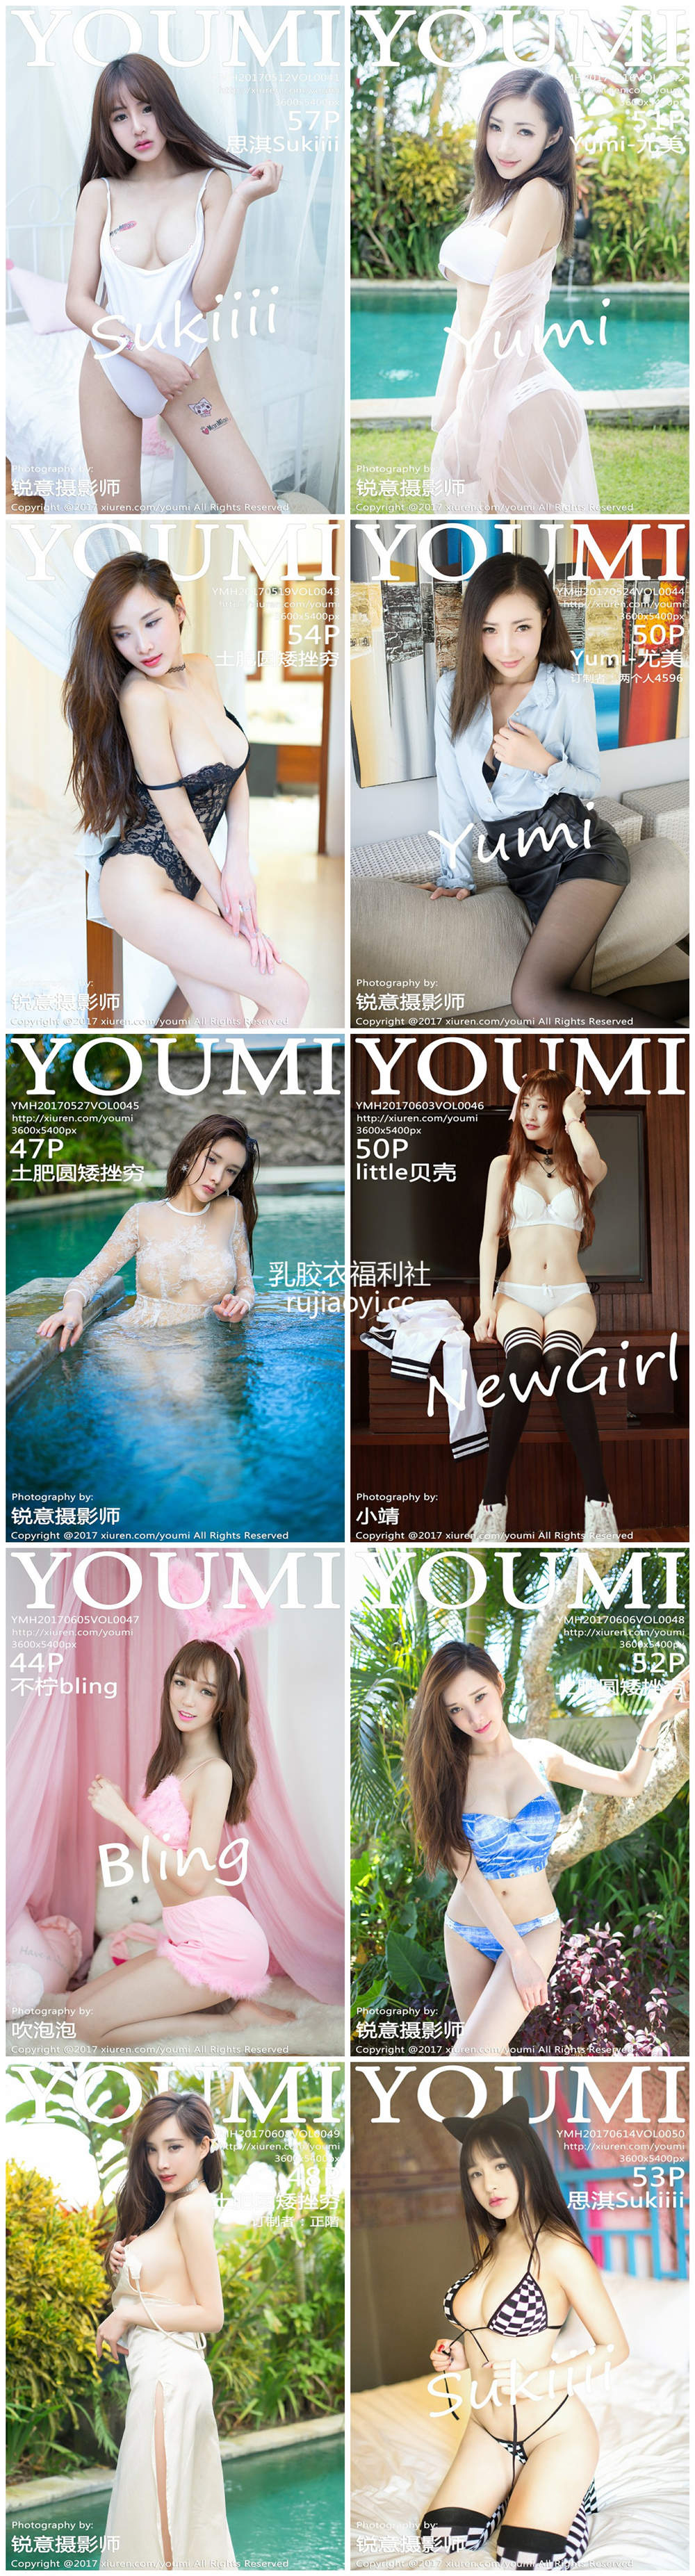 [YOUMI尤蜜荟] Vol.041-050 秀人旗下系列 10期性感美女写真百度云合集下载